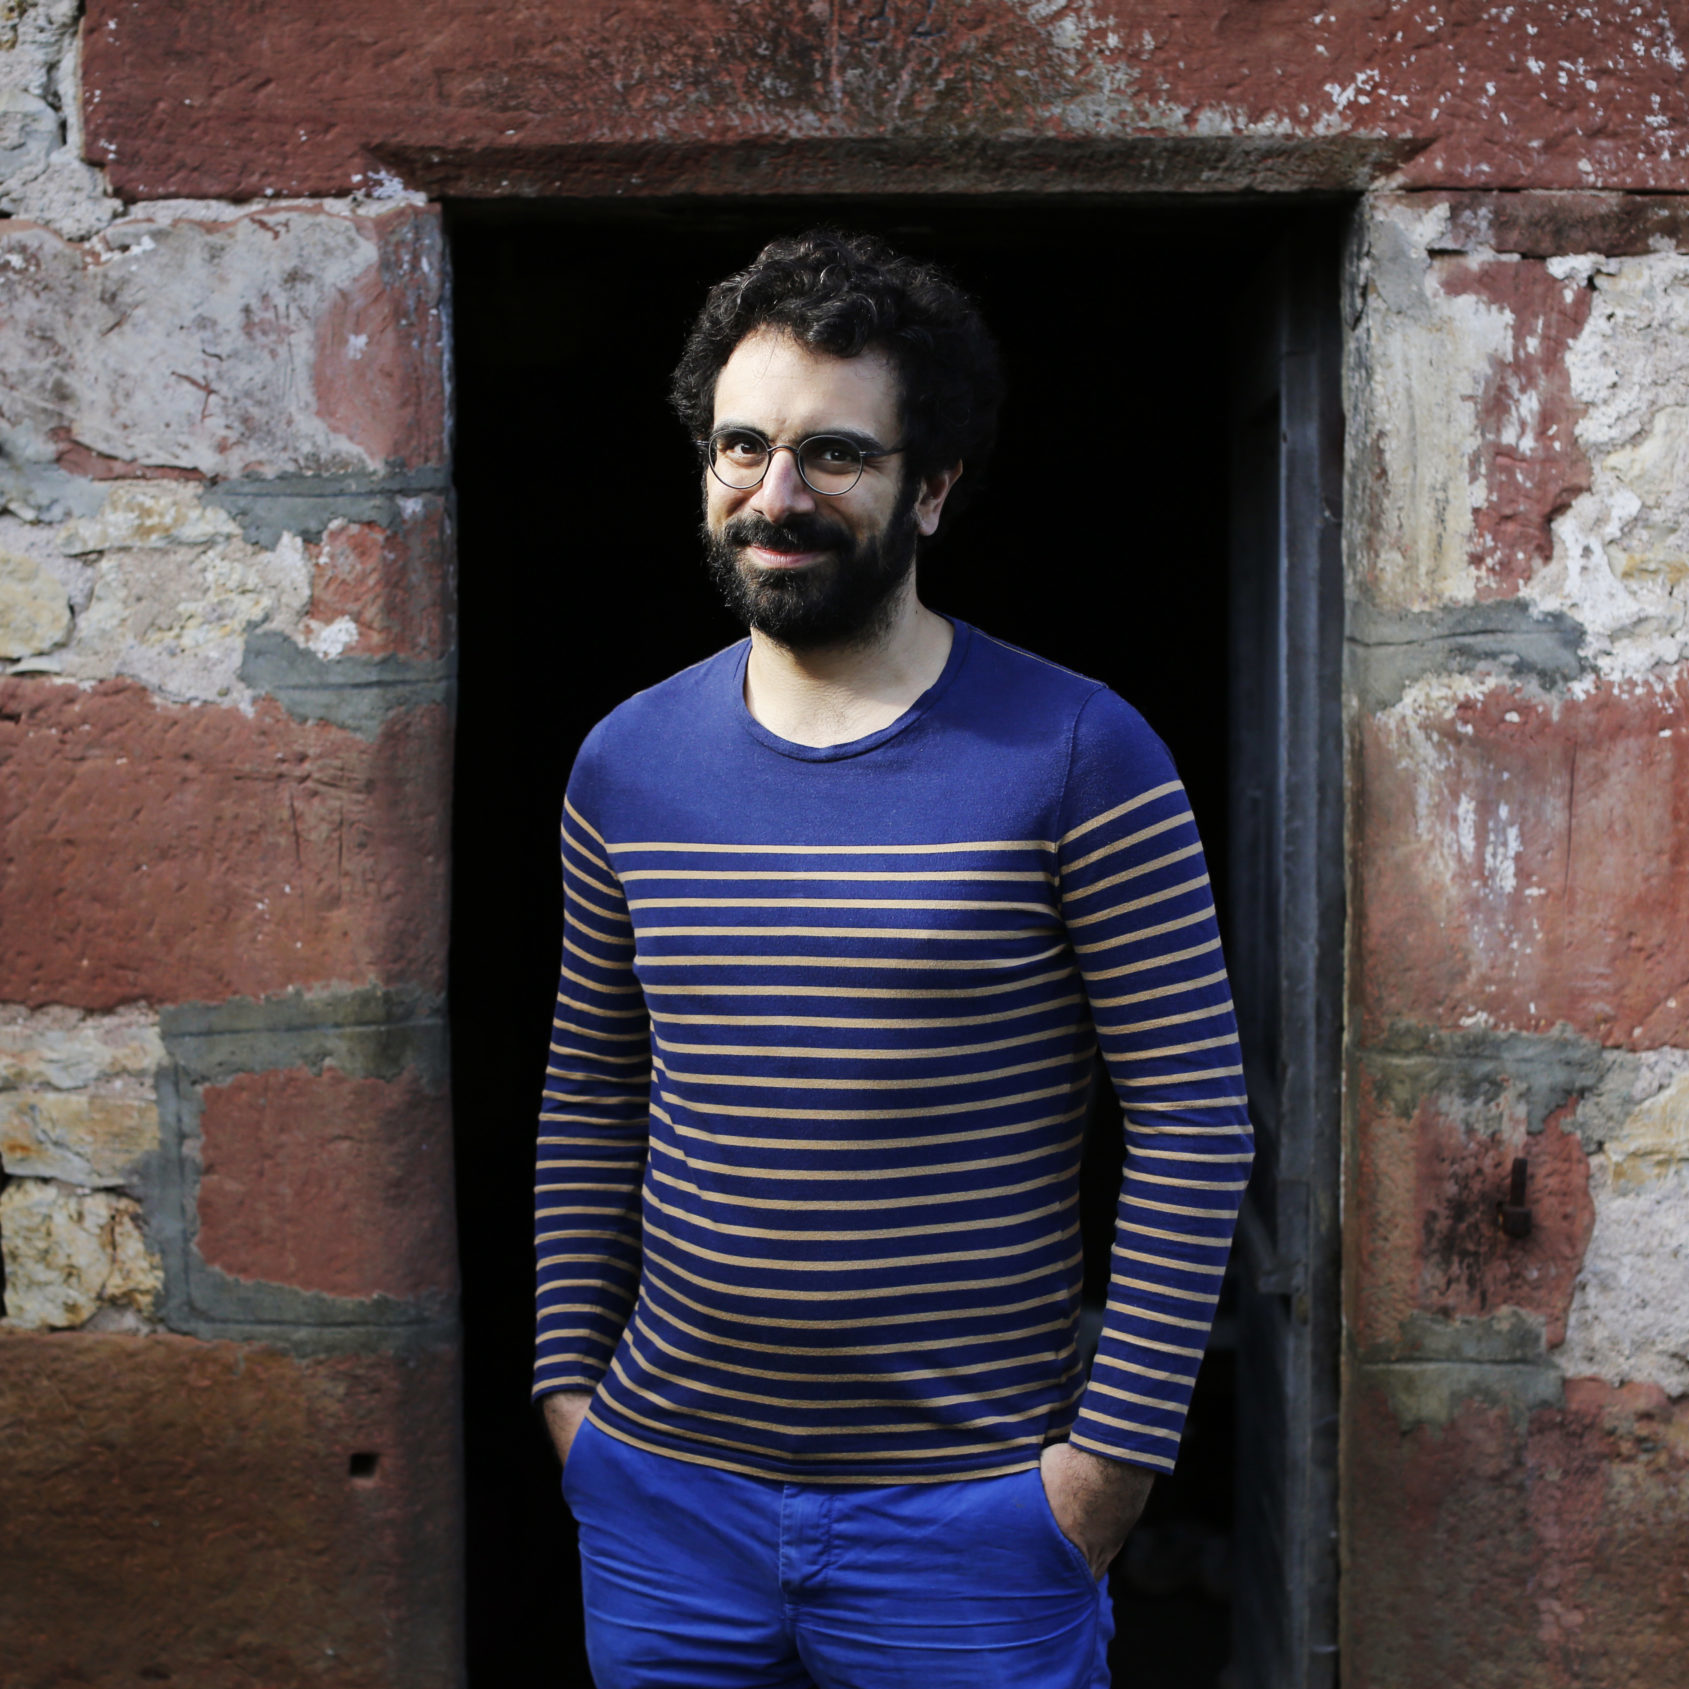 Portrait de Nabil Wakim